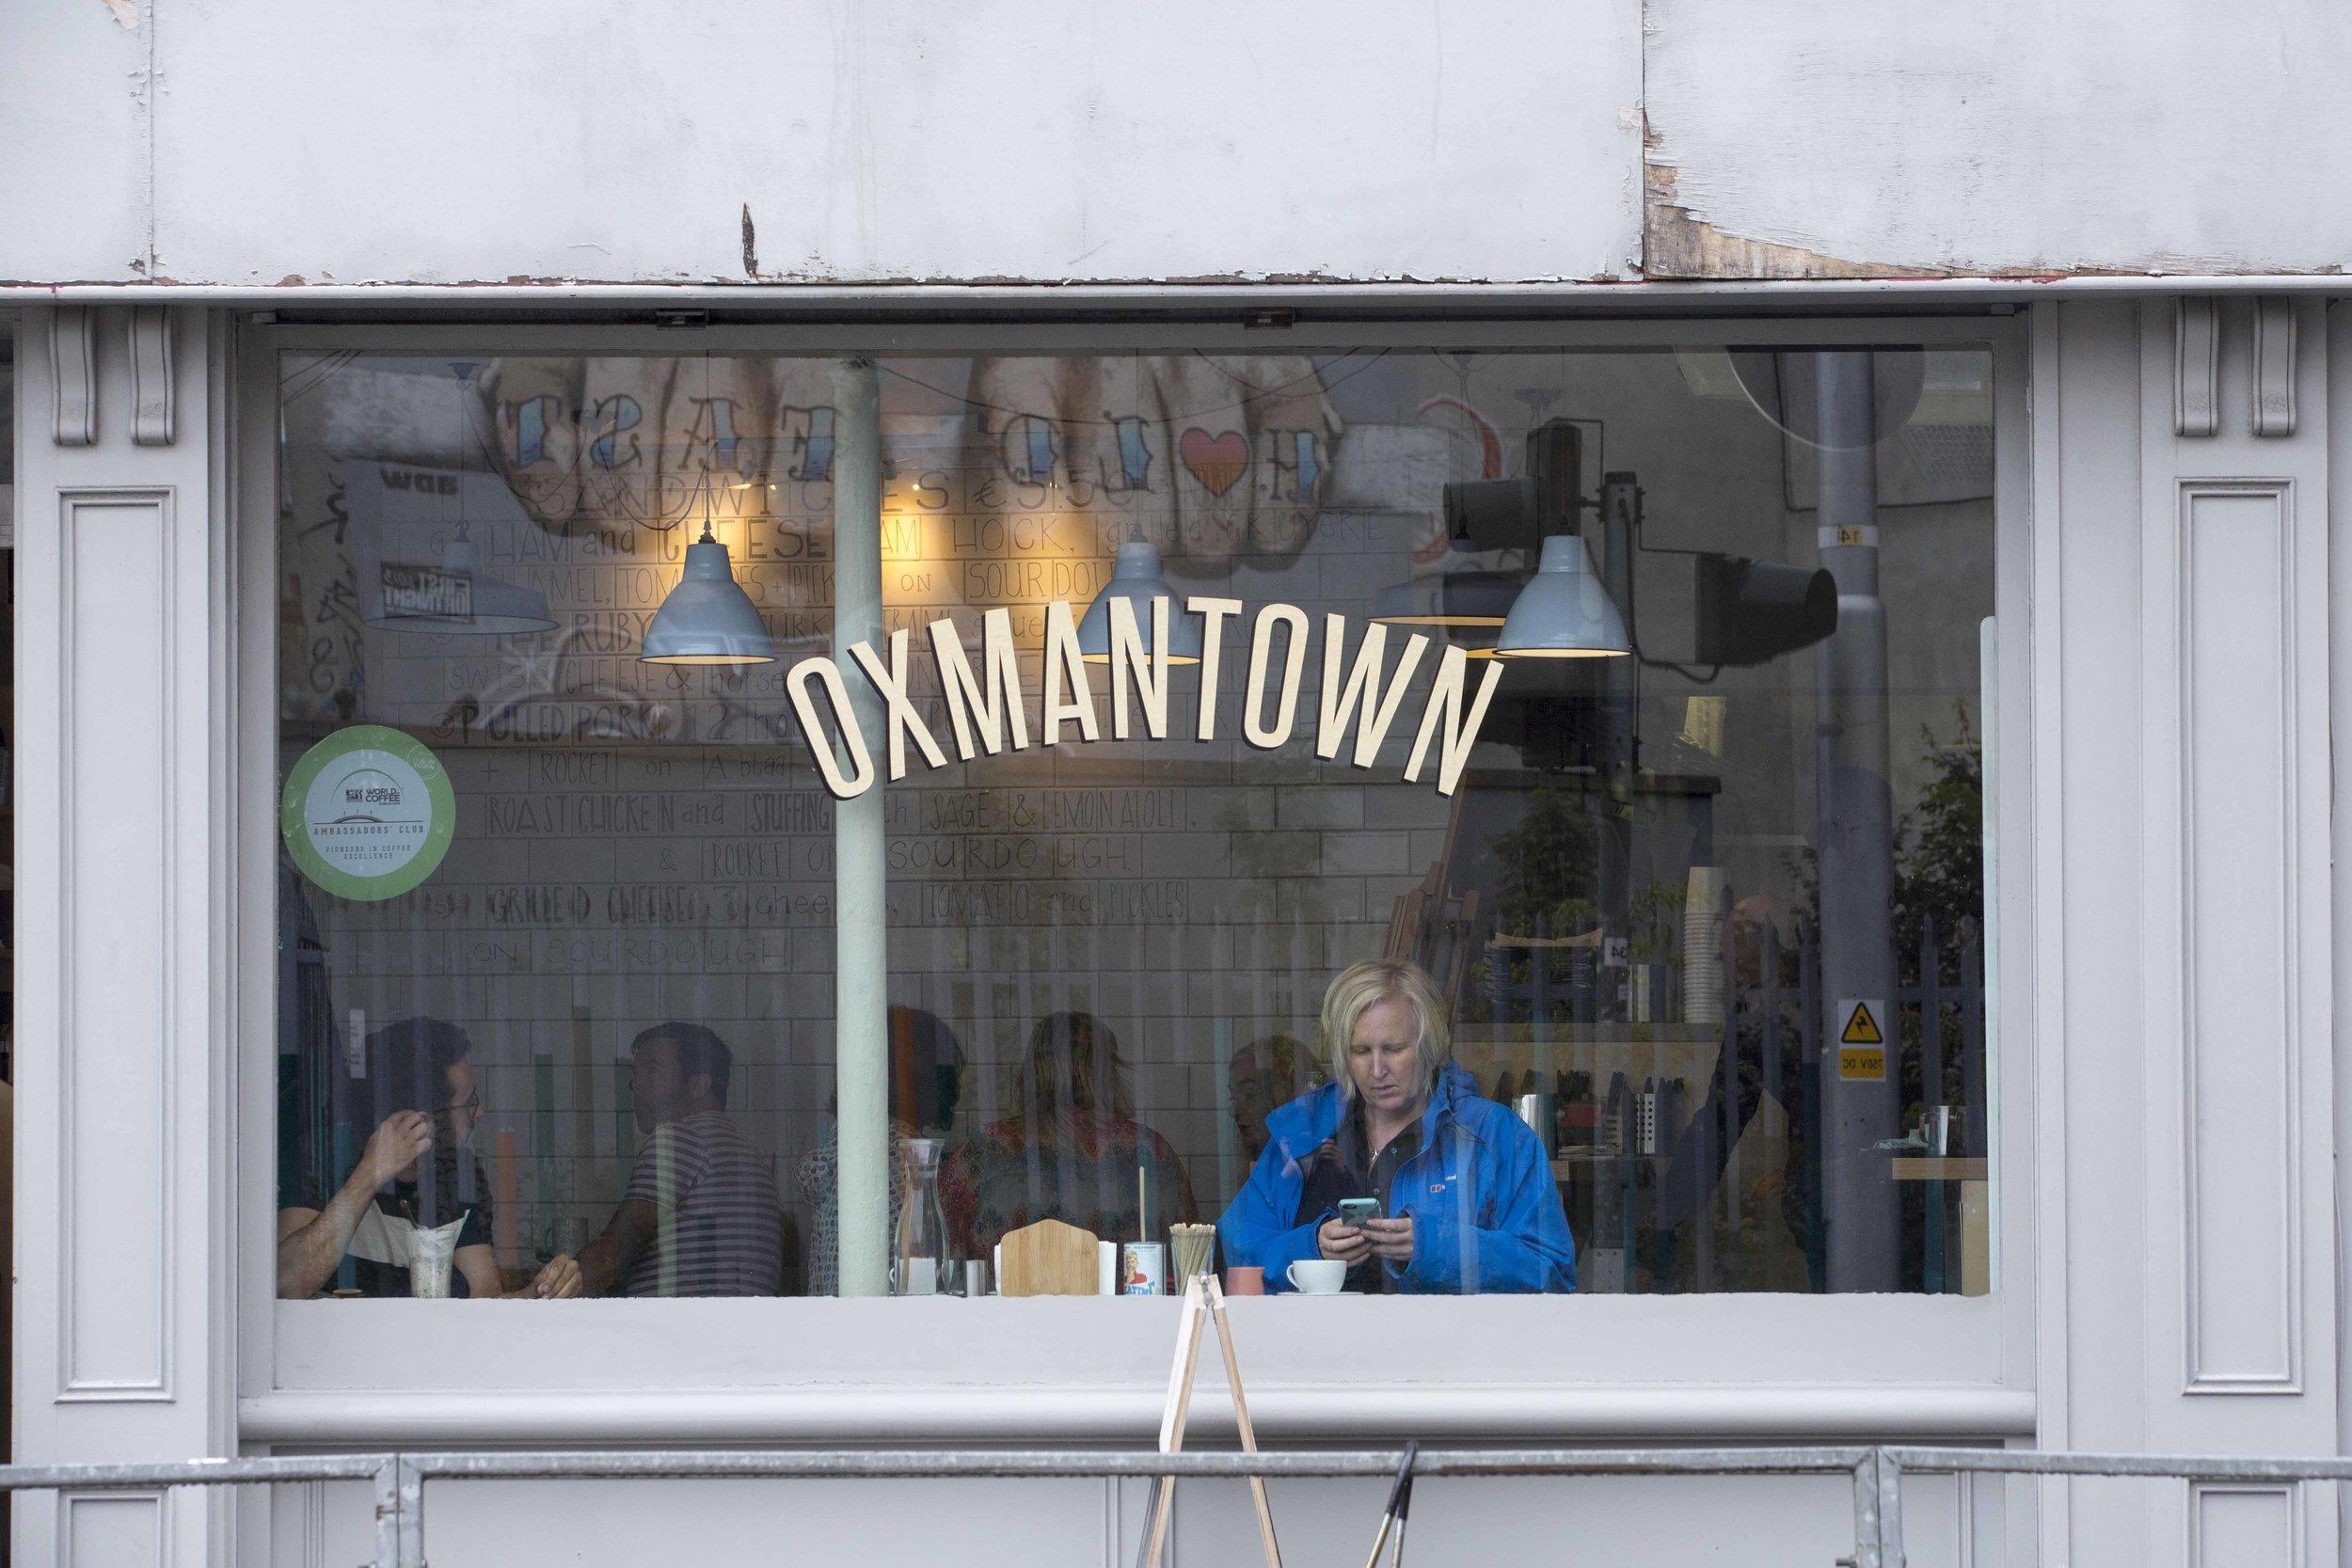 Heather-McGuire-Coffee-OxmanTown-Dublin